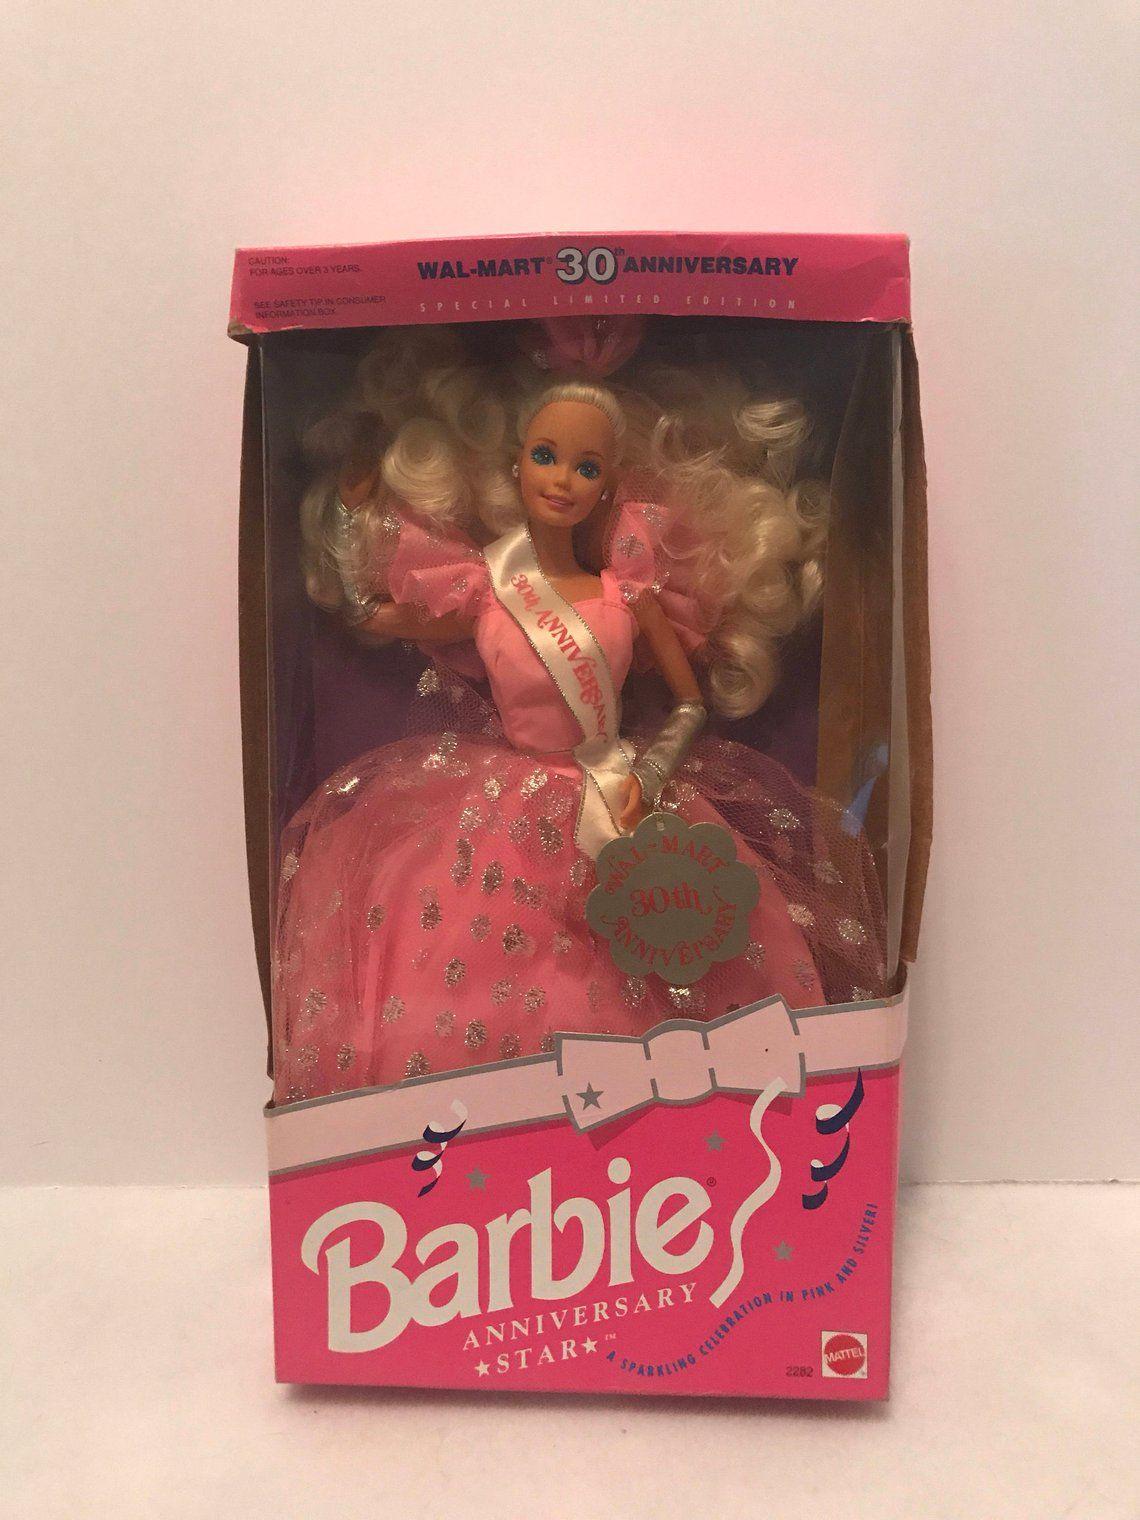 1992 Walmart 30th Anniversary Star Barbie Doll Etsy Vintage Barbie Dolls Barbie Dolls Beautiful Barbie Dolls